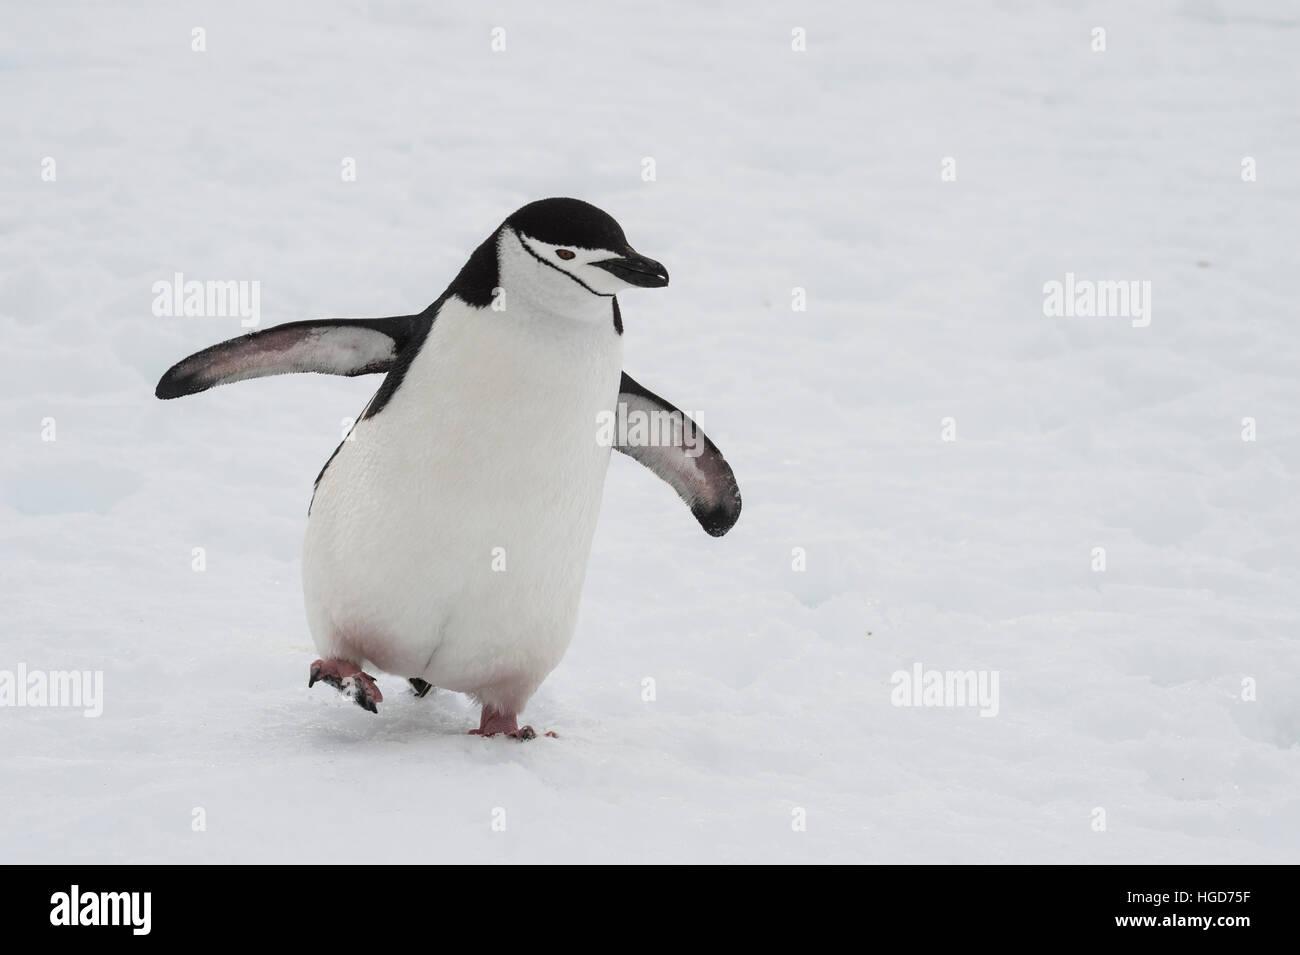 Chinstarp Penguin on the snow - Stock Image